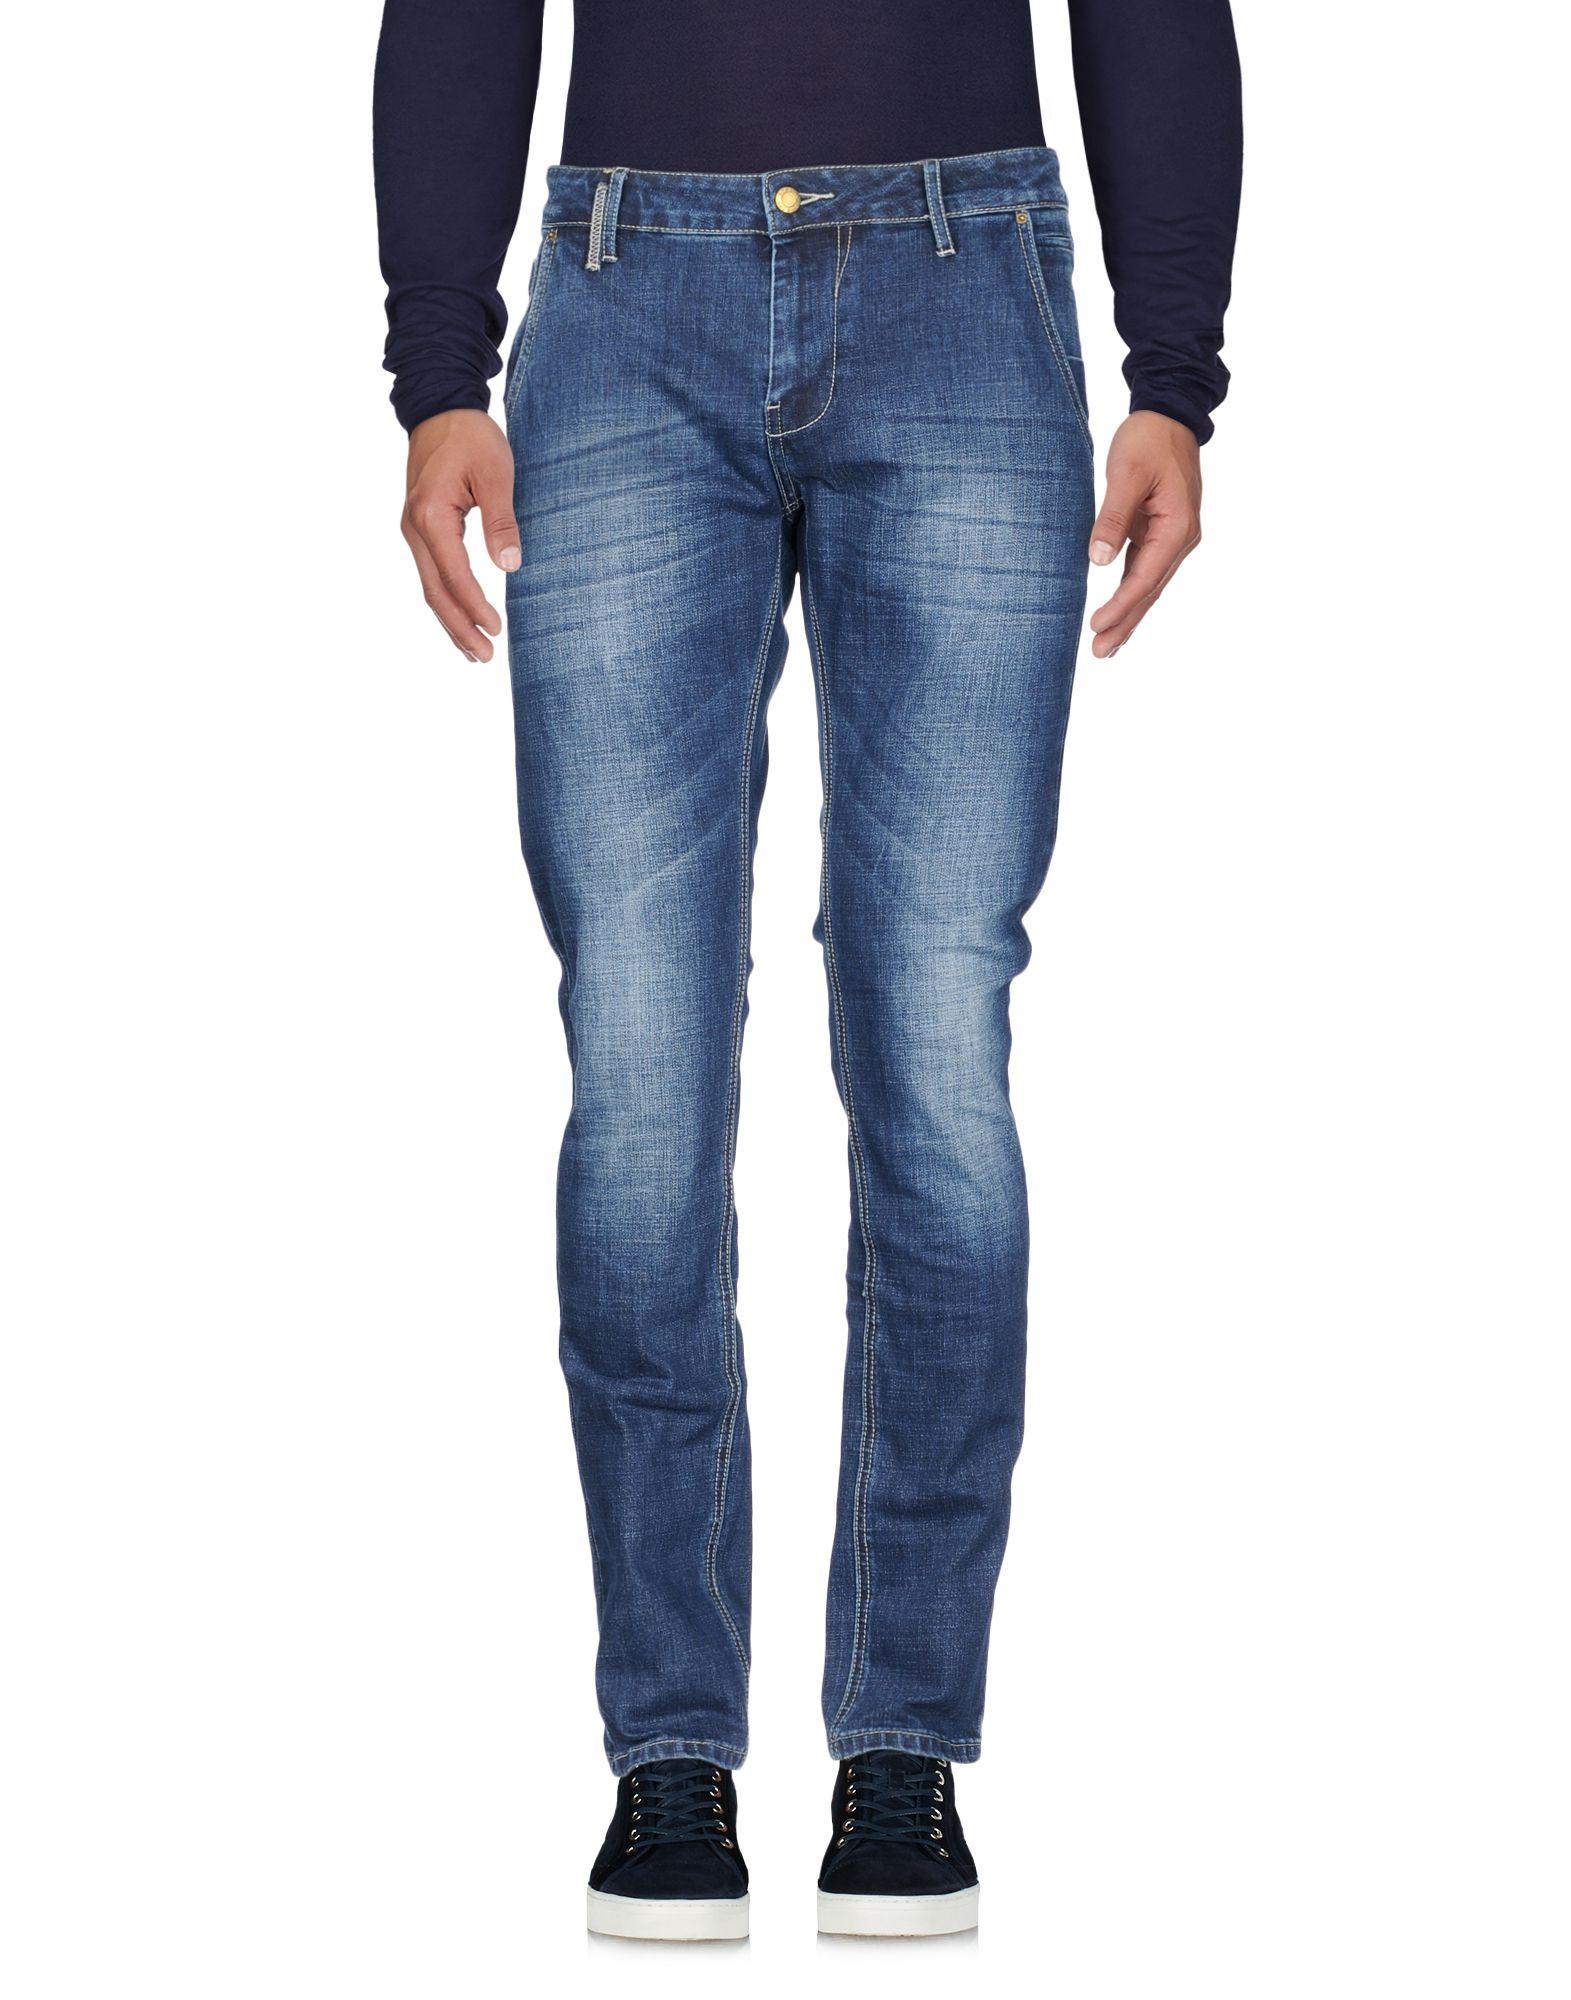 Pantaloni Jeans Take-Two Uomo 42682410MS - 42682410MS Uomo 3bc20b